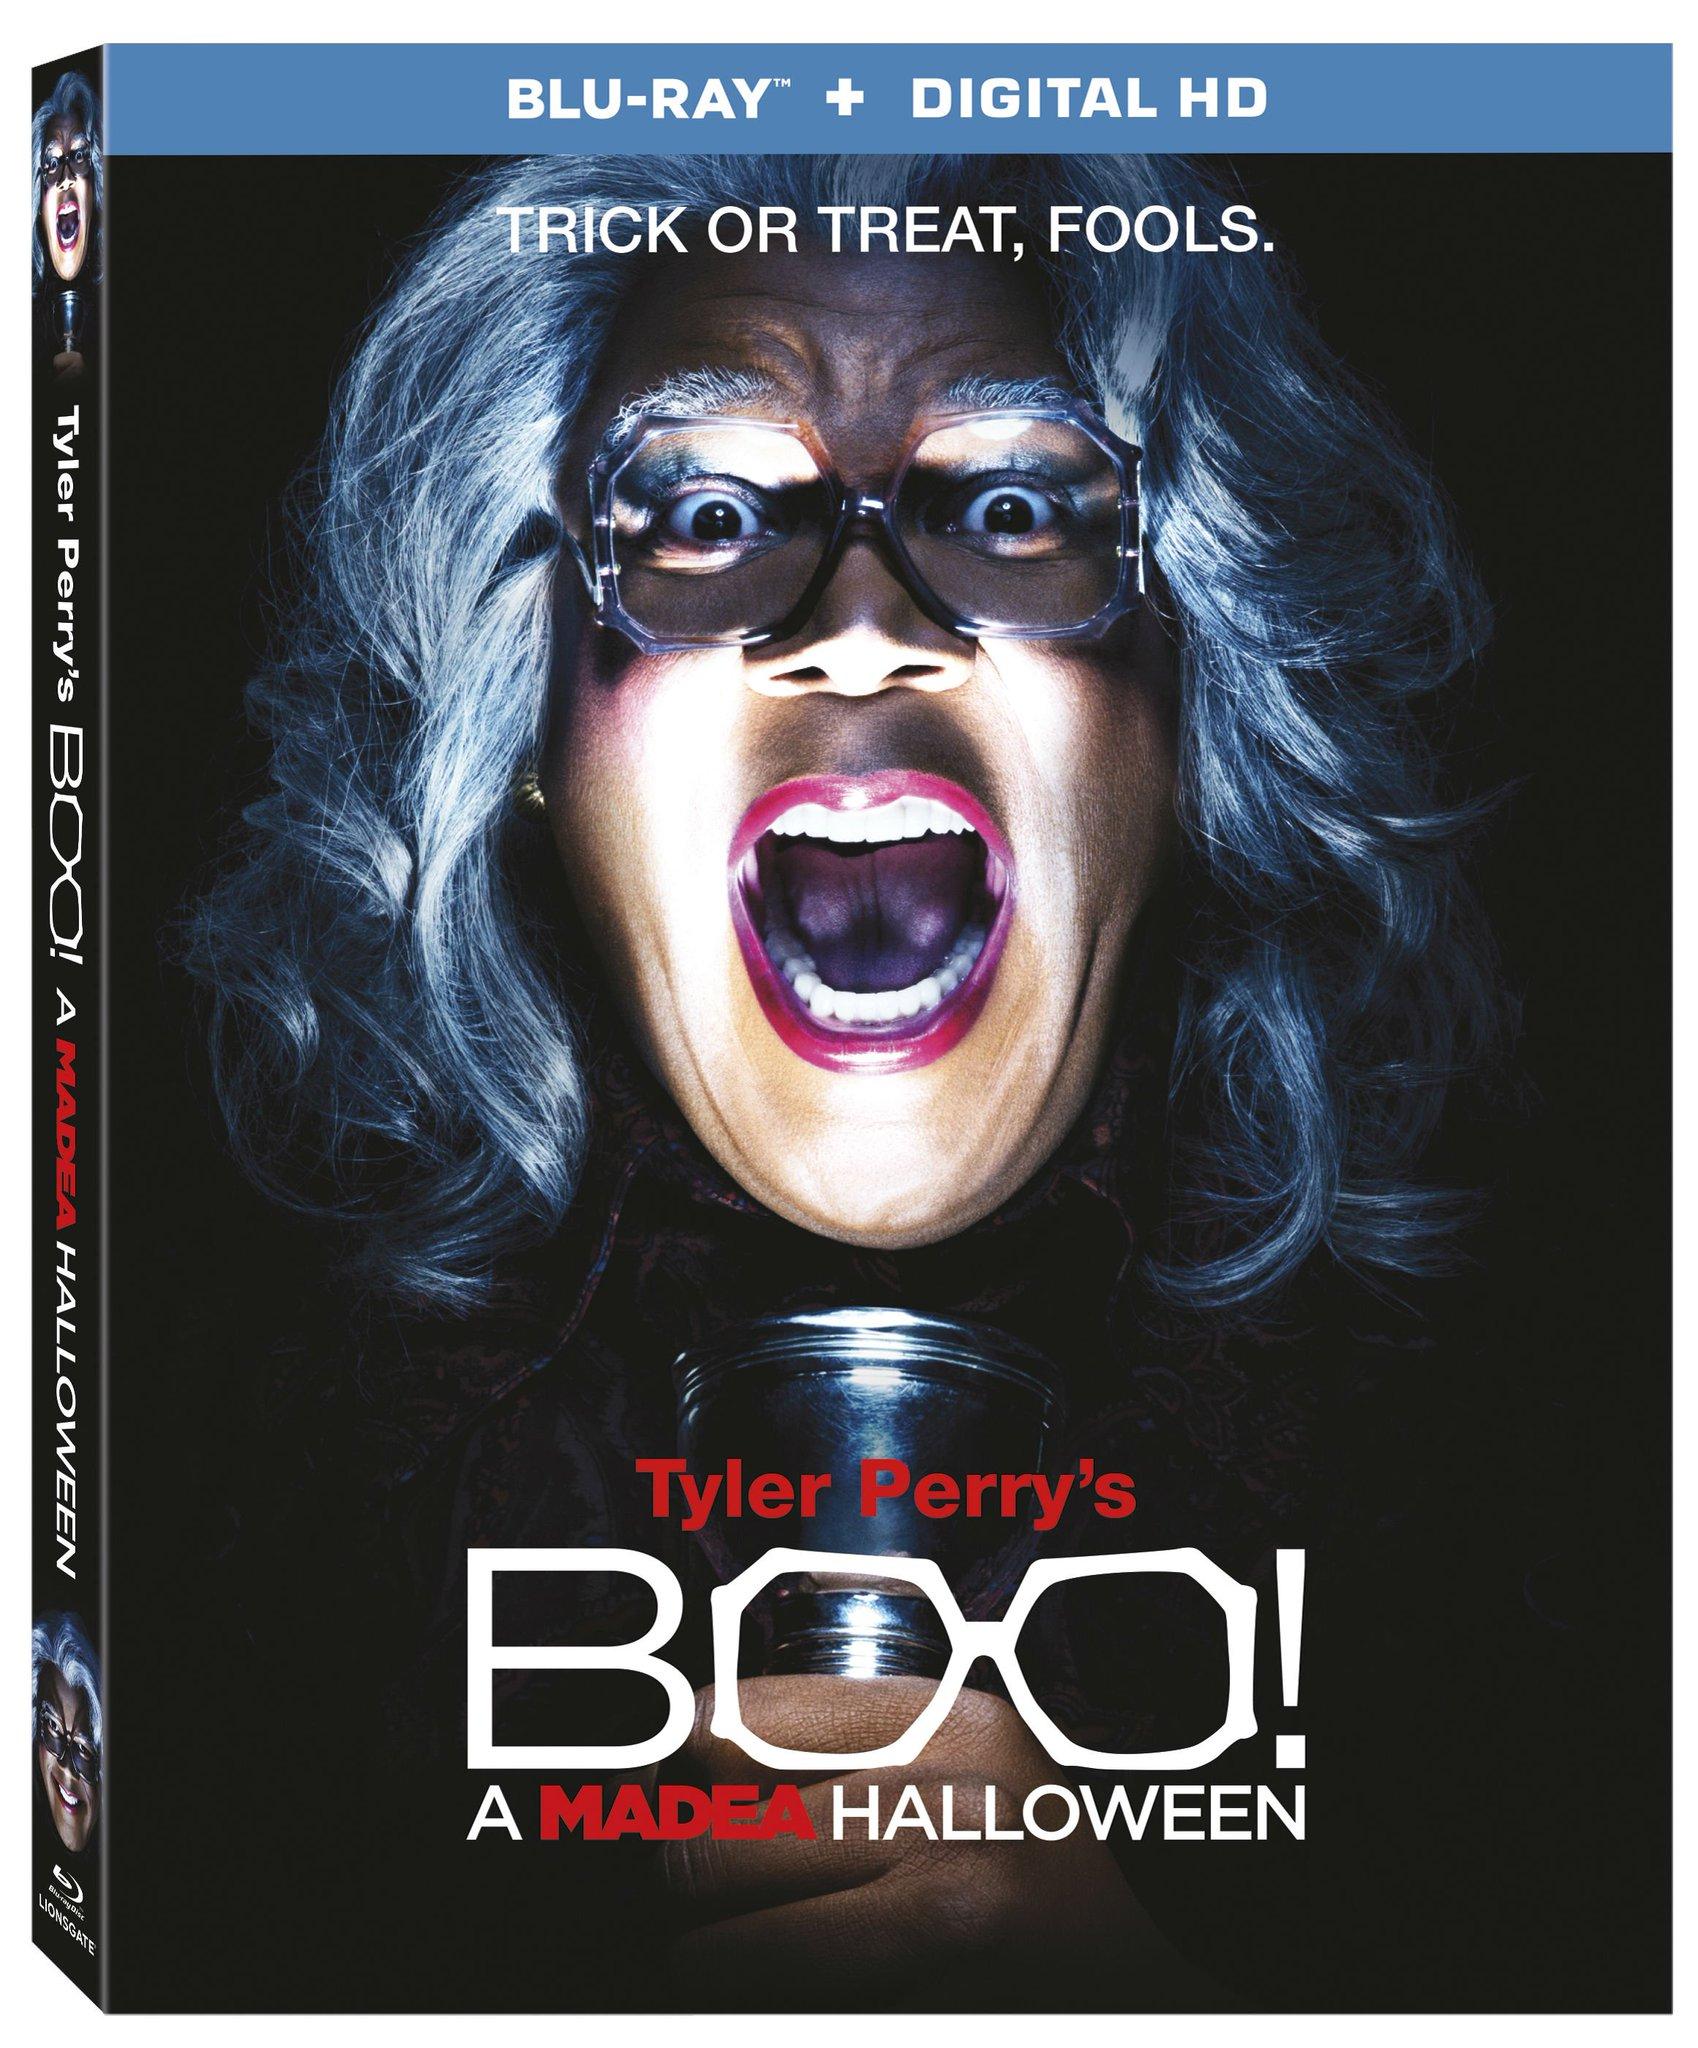 tyler perry's boo! a madea halloween: comedy horror movie box